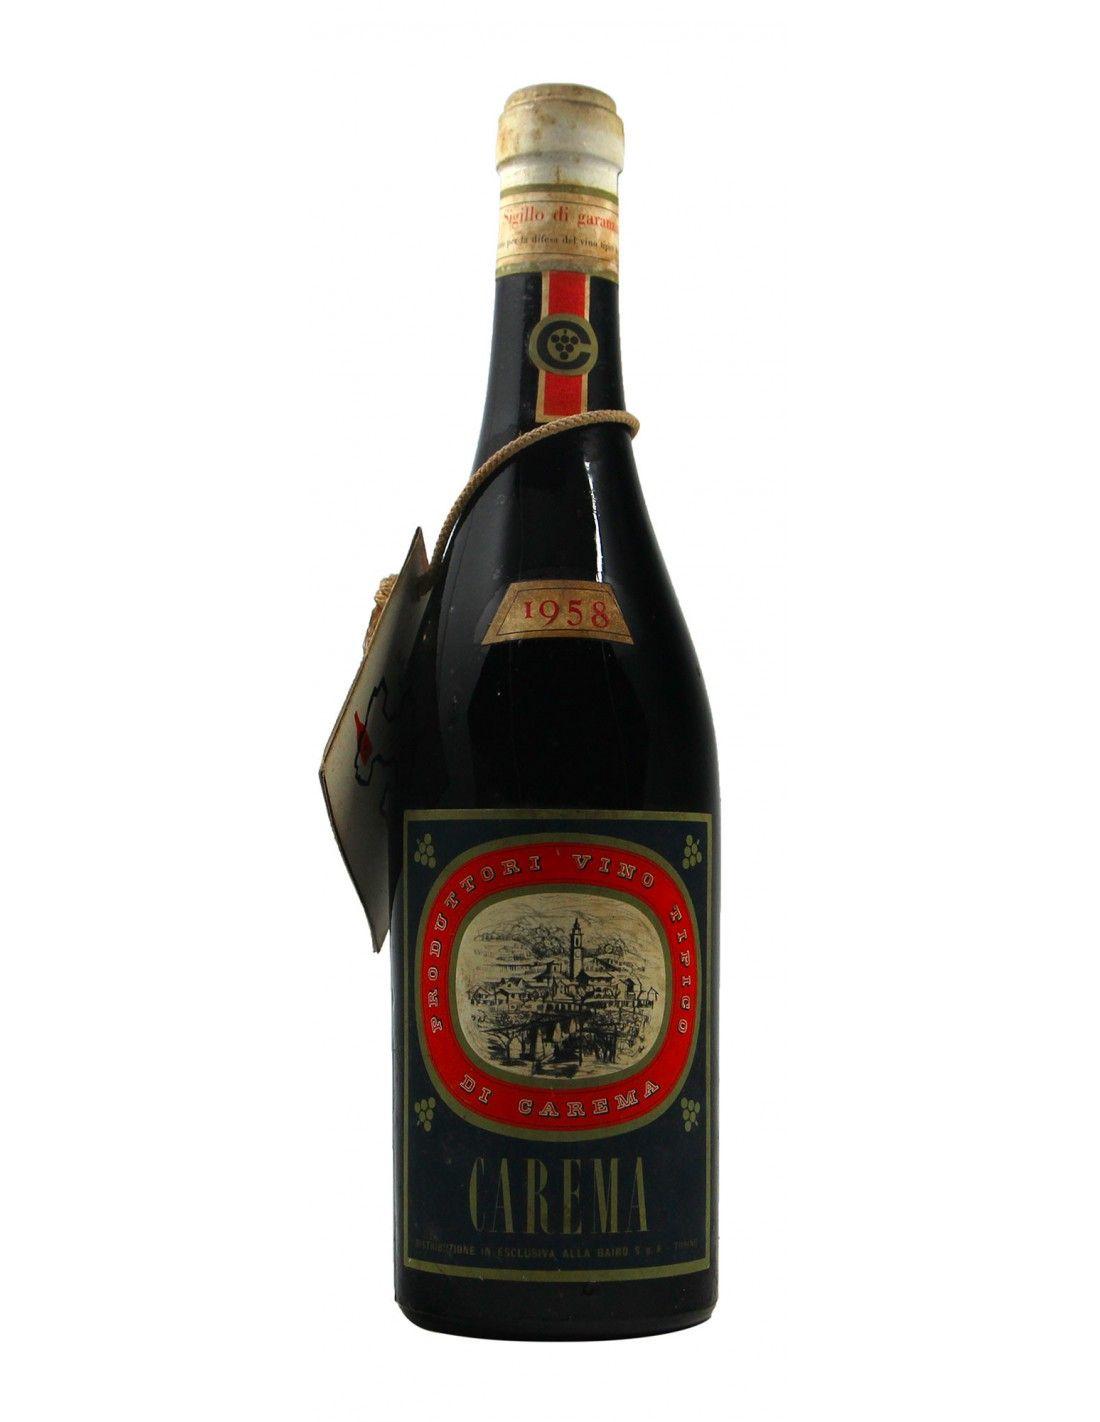 CAREMA 1958 CANTINA DEI PRODUTTORI DI NEBBIOLO DI CAREMA Grandi Bottiglie